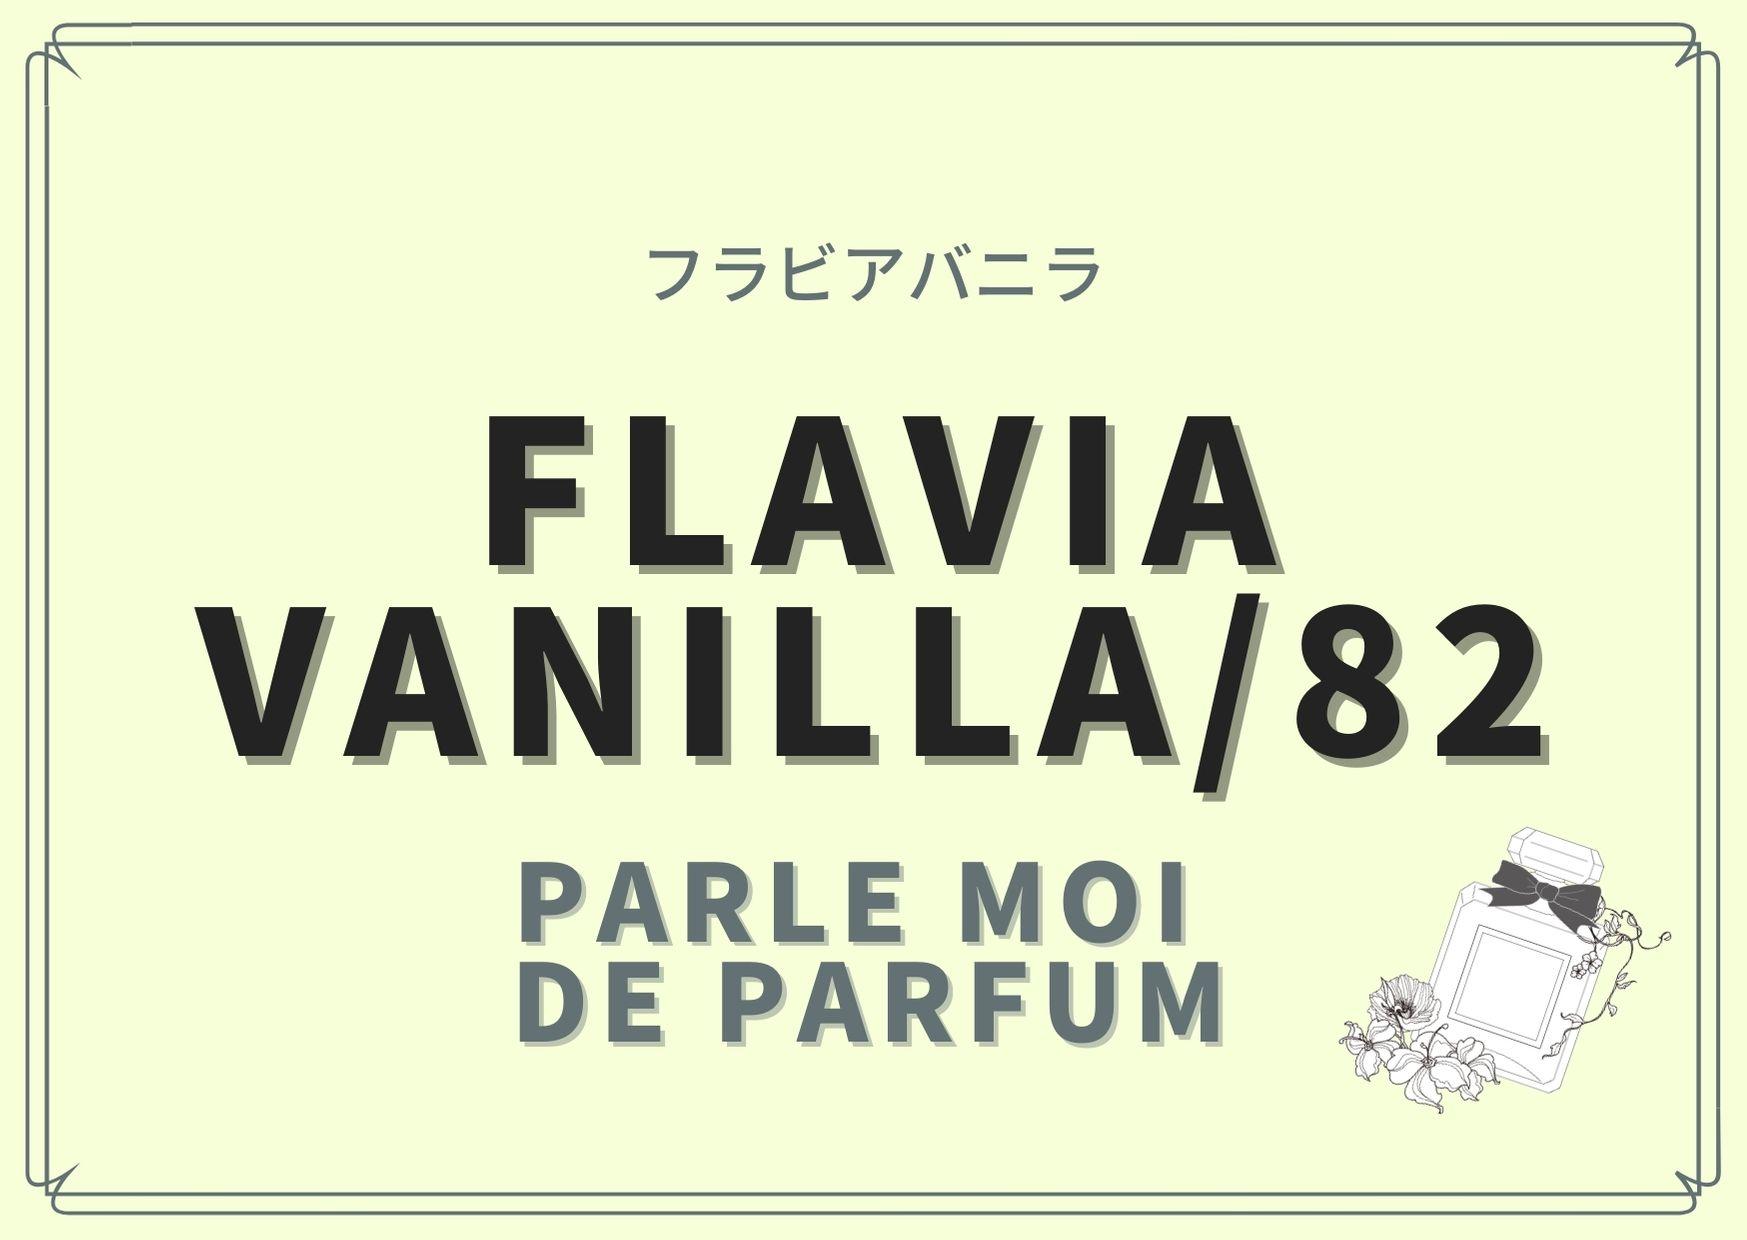 FLAVIA VANILLA/82(フラビアバニラ )/PARLE MOI DE PARFUM(パルル モア ドゥ パルファム)